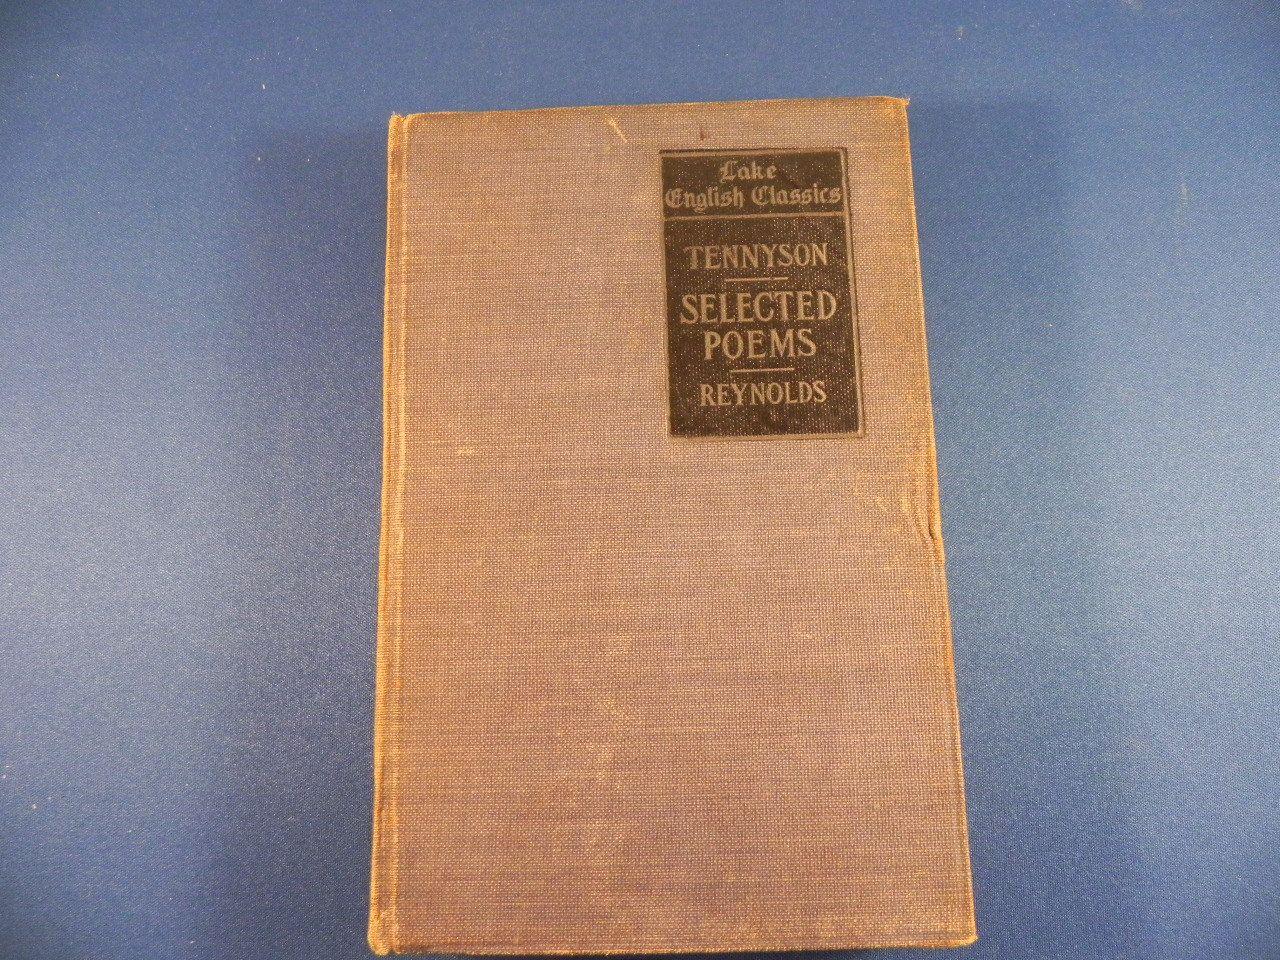 Antique Book Lake English Classics Of Tennyson Poems